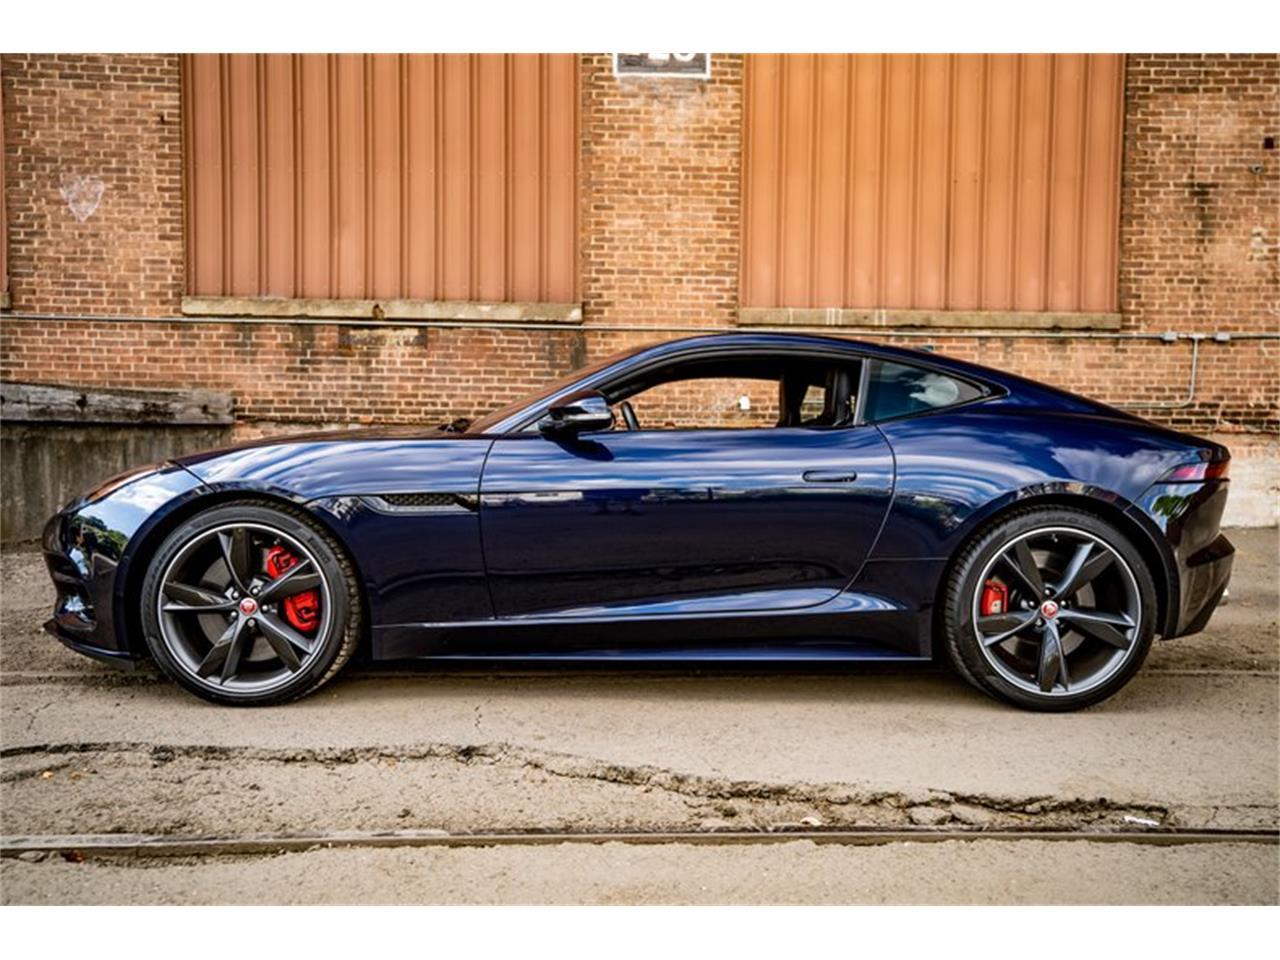 2018 Jaguar F-Type for Sale | ClassicCars.com | CC-1234616